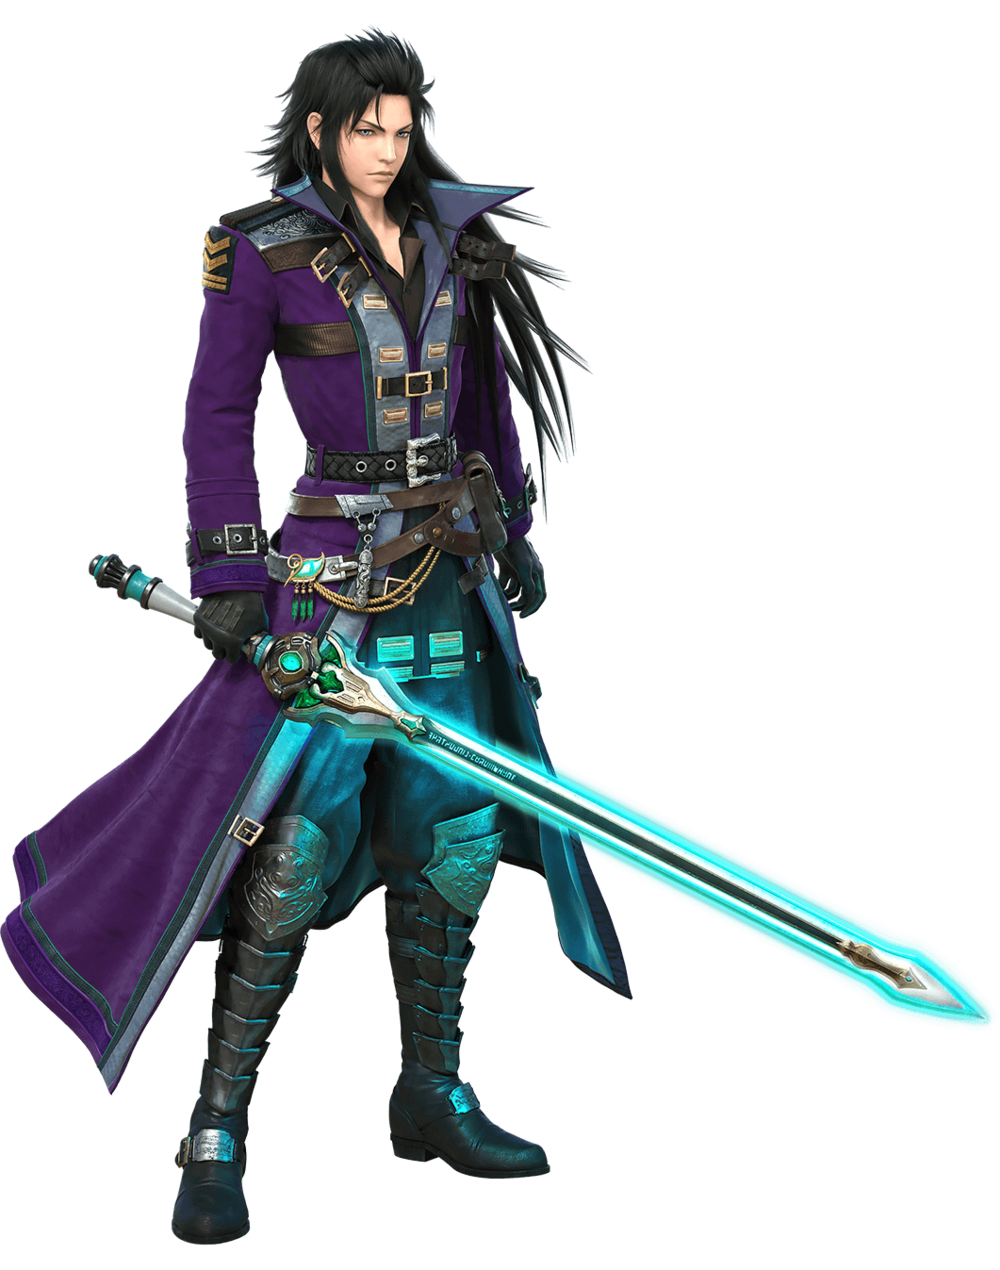 Lasswell Final Fantasy Final Fantasy Characters Final Fantasy Artwork